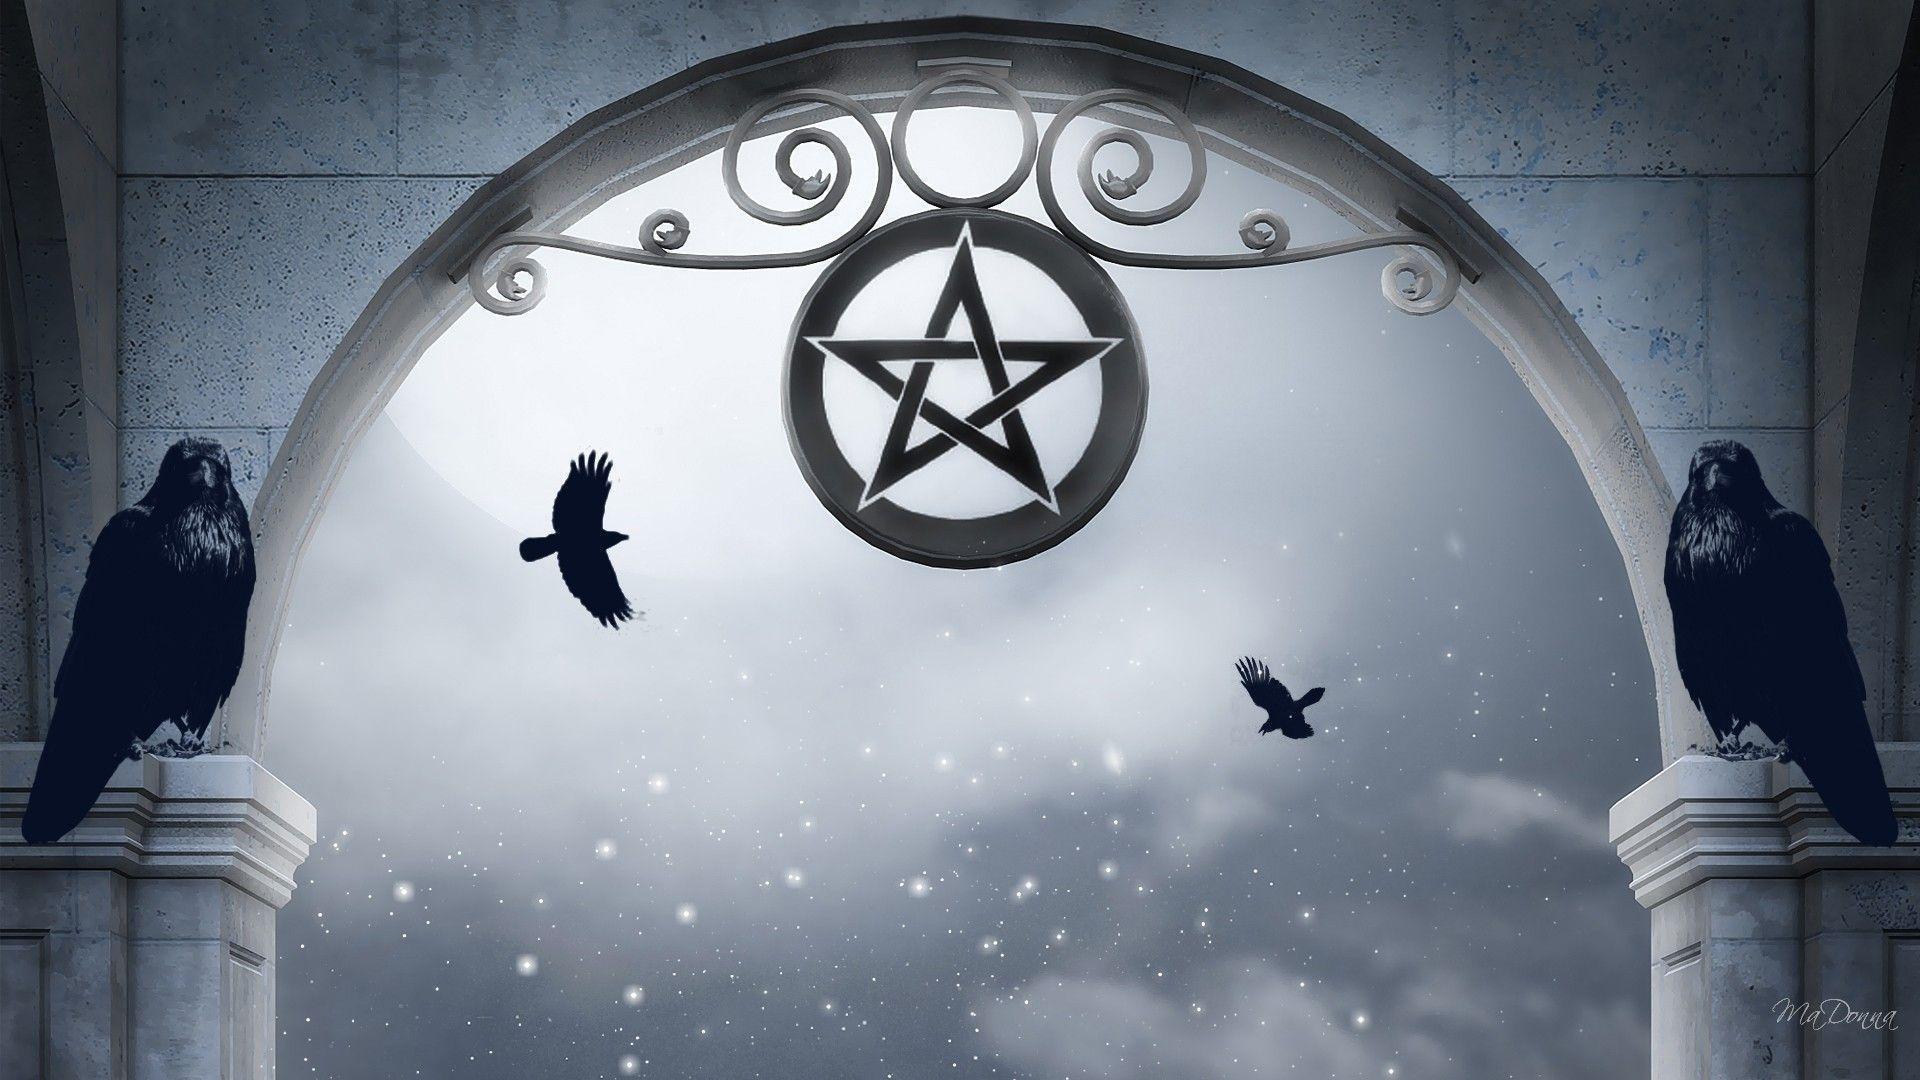 Res: 1920x1080, Pentagram wallpaper